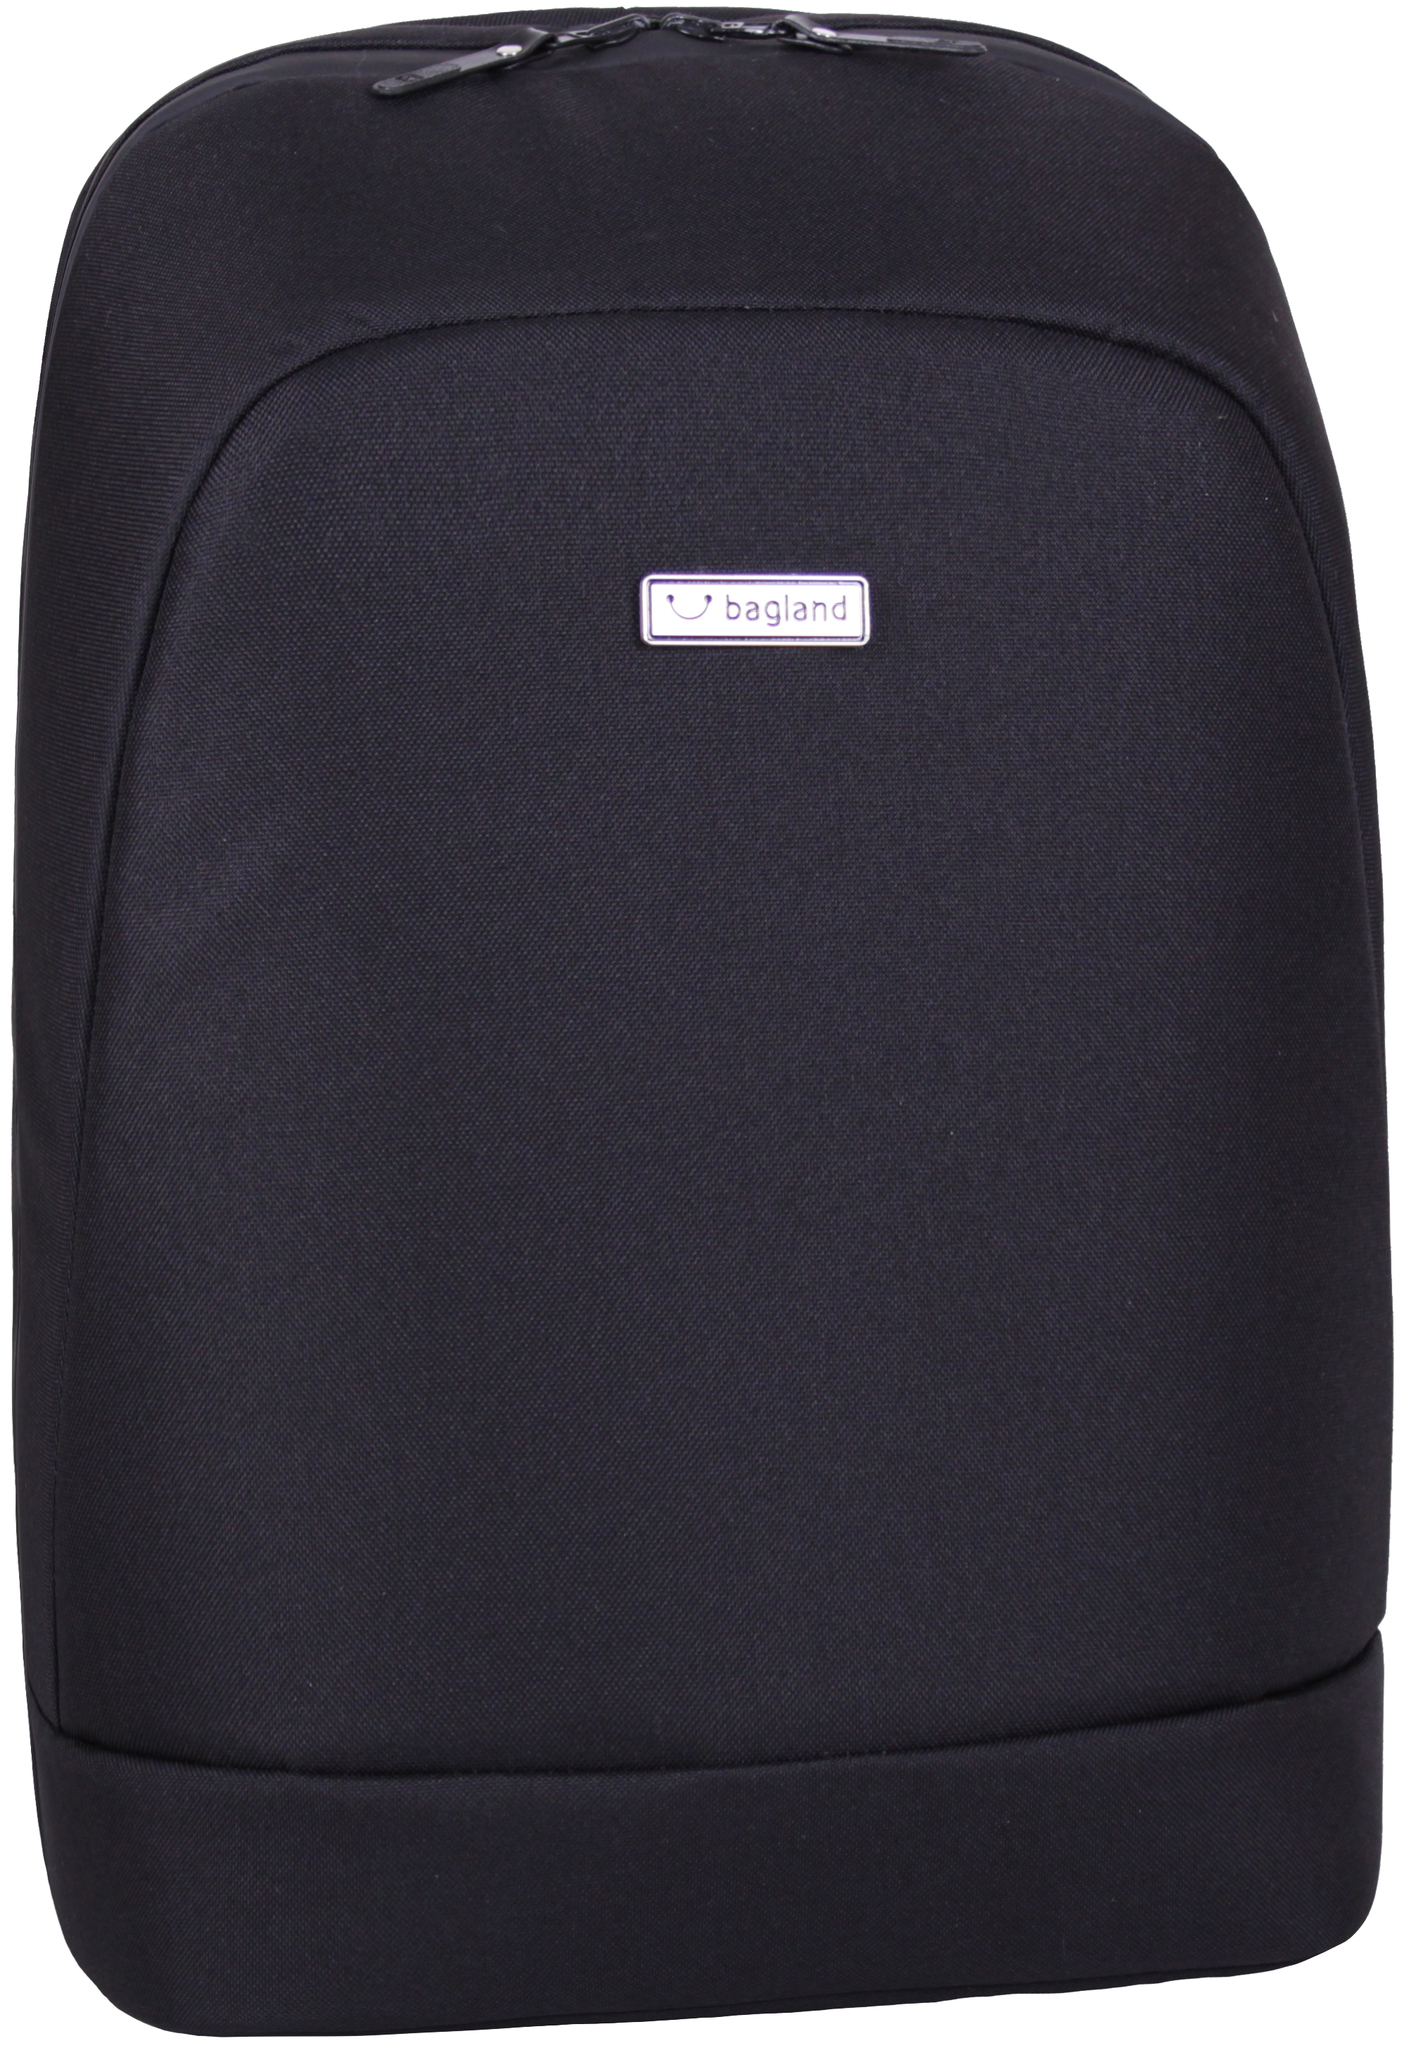 Каталог Рюкзак для ноутбука Bagland Advantage 23 л. Чёрный (0013566) IMG_2526.JPG